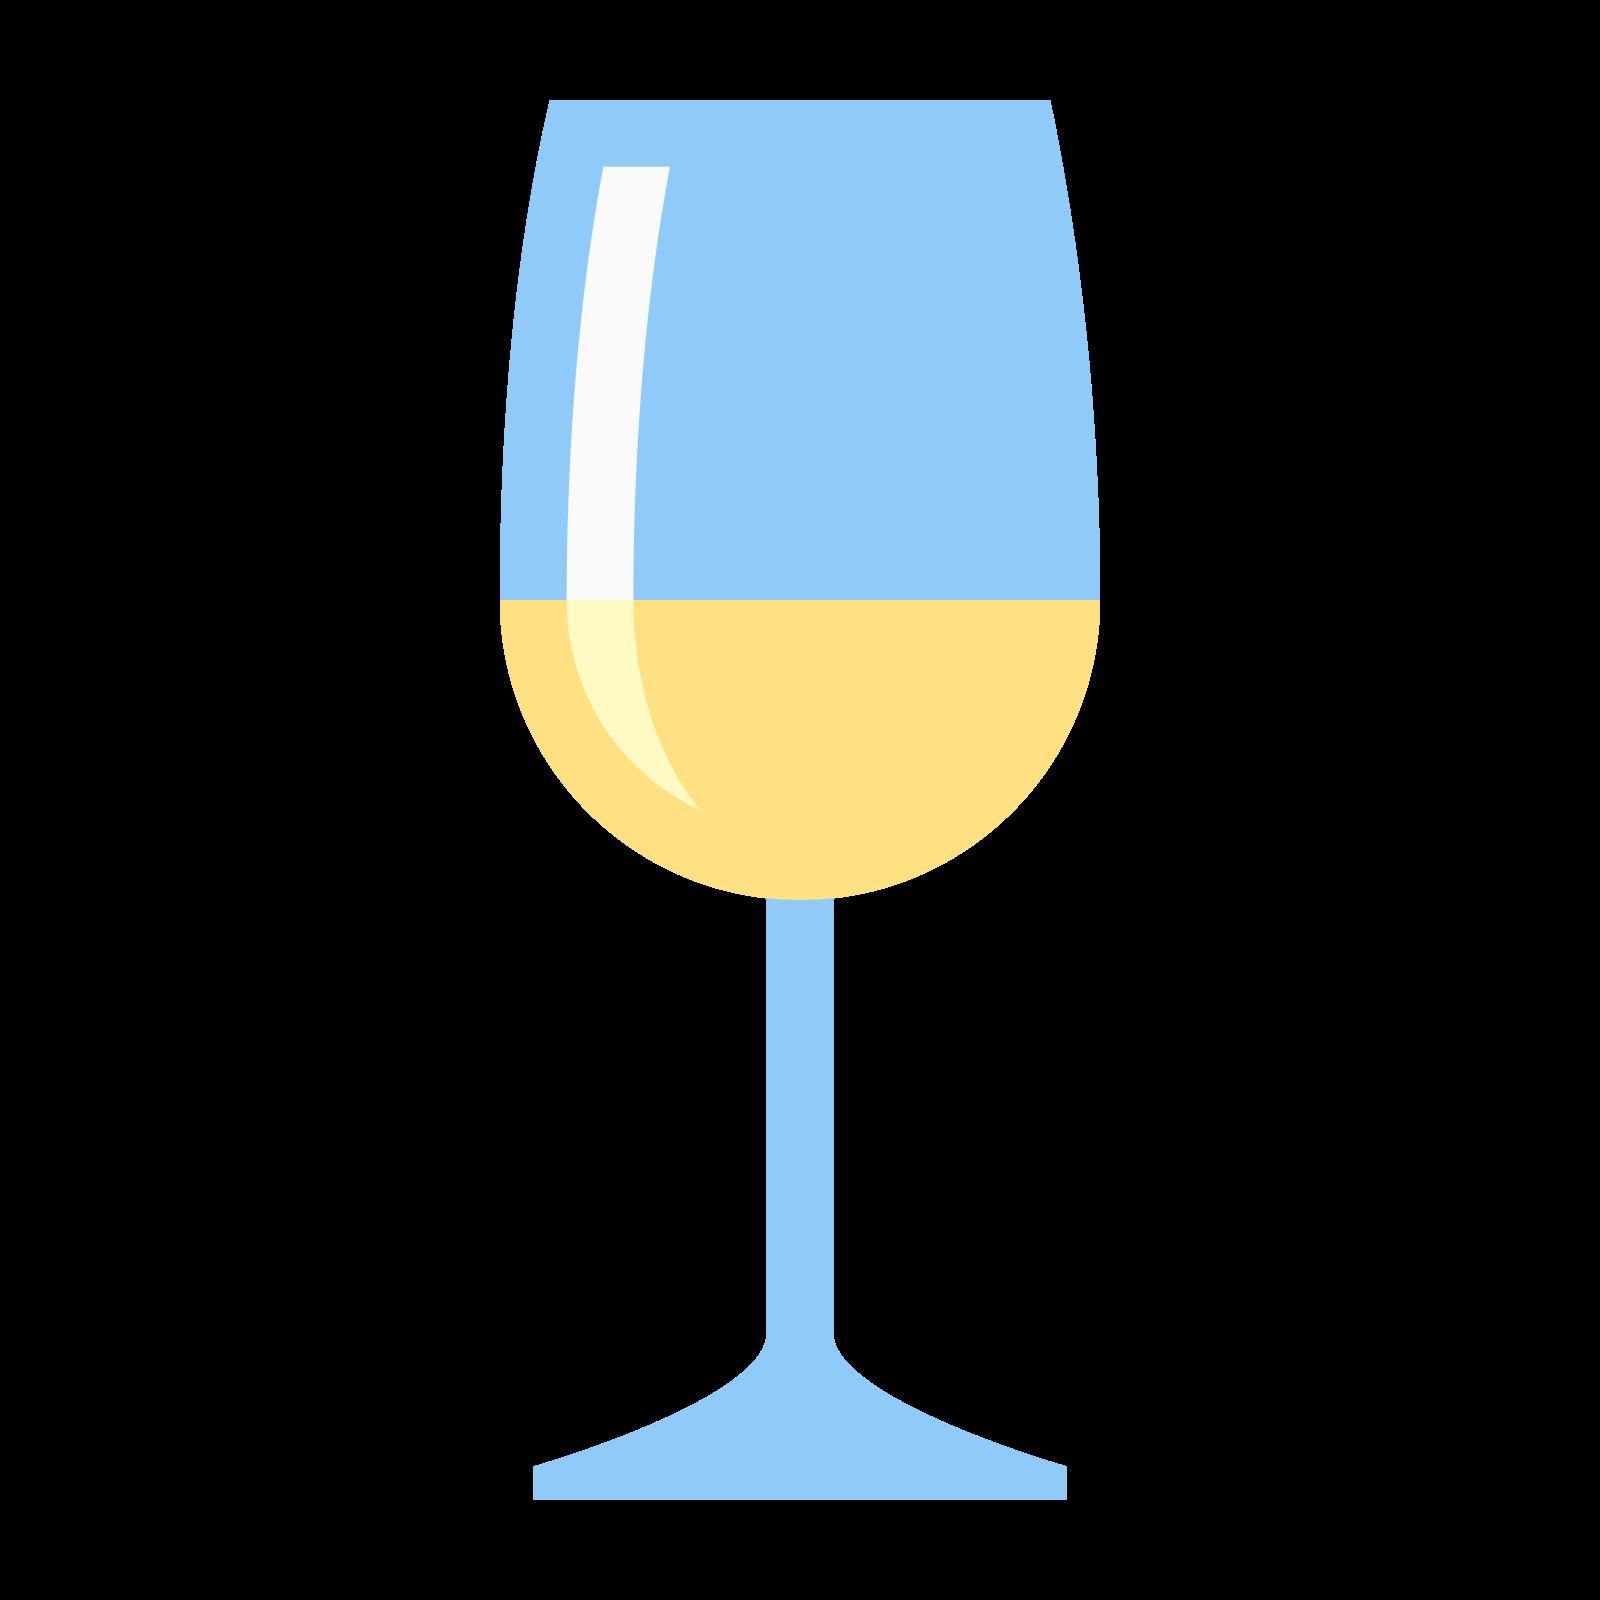 Białe wino icon